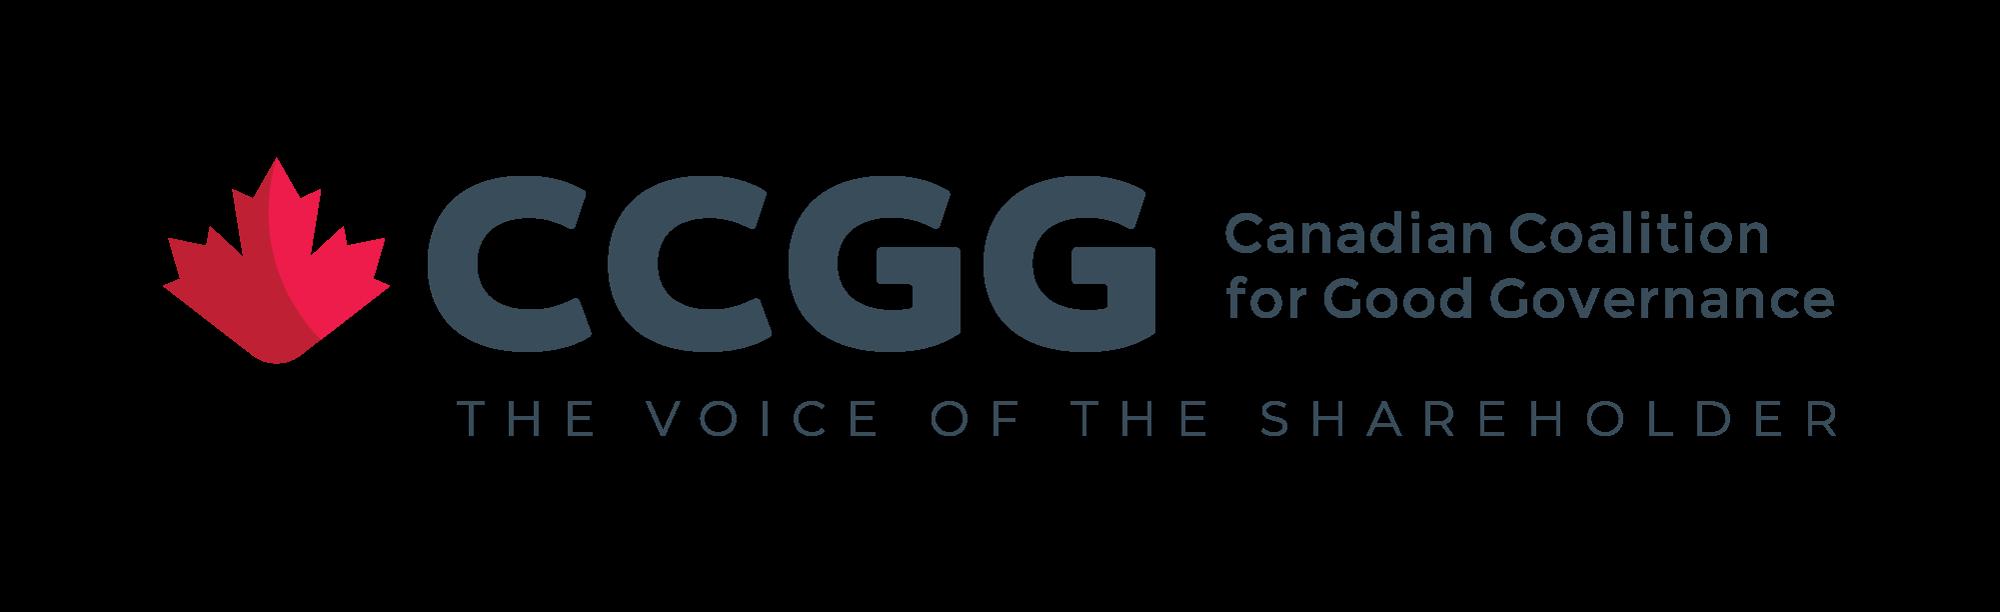 CCGG Stewardship Principles